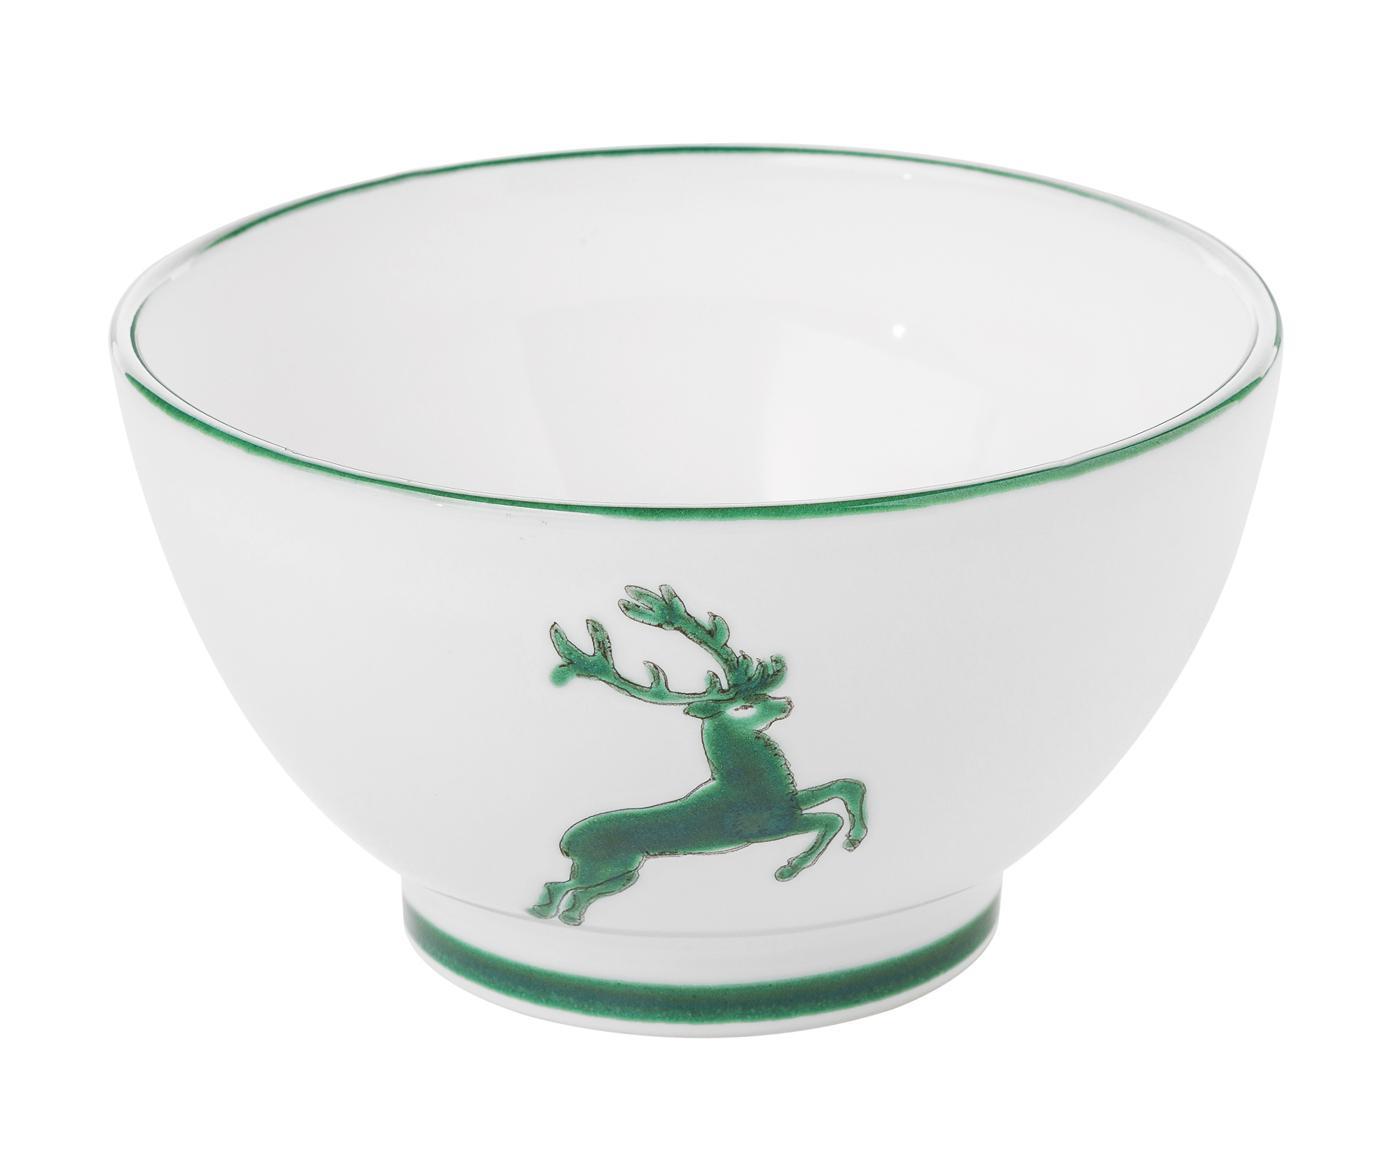 Miska Grüner Hirsch, Ceramika, Zielony, biały, Ø 14 cm